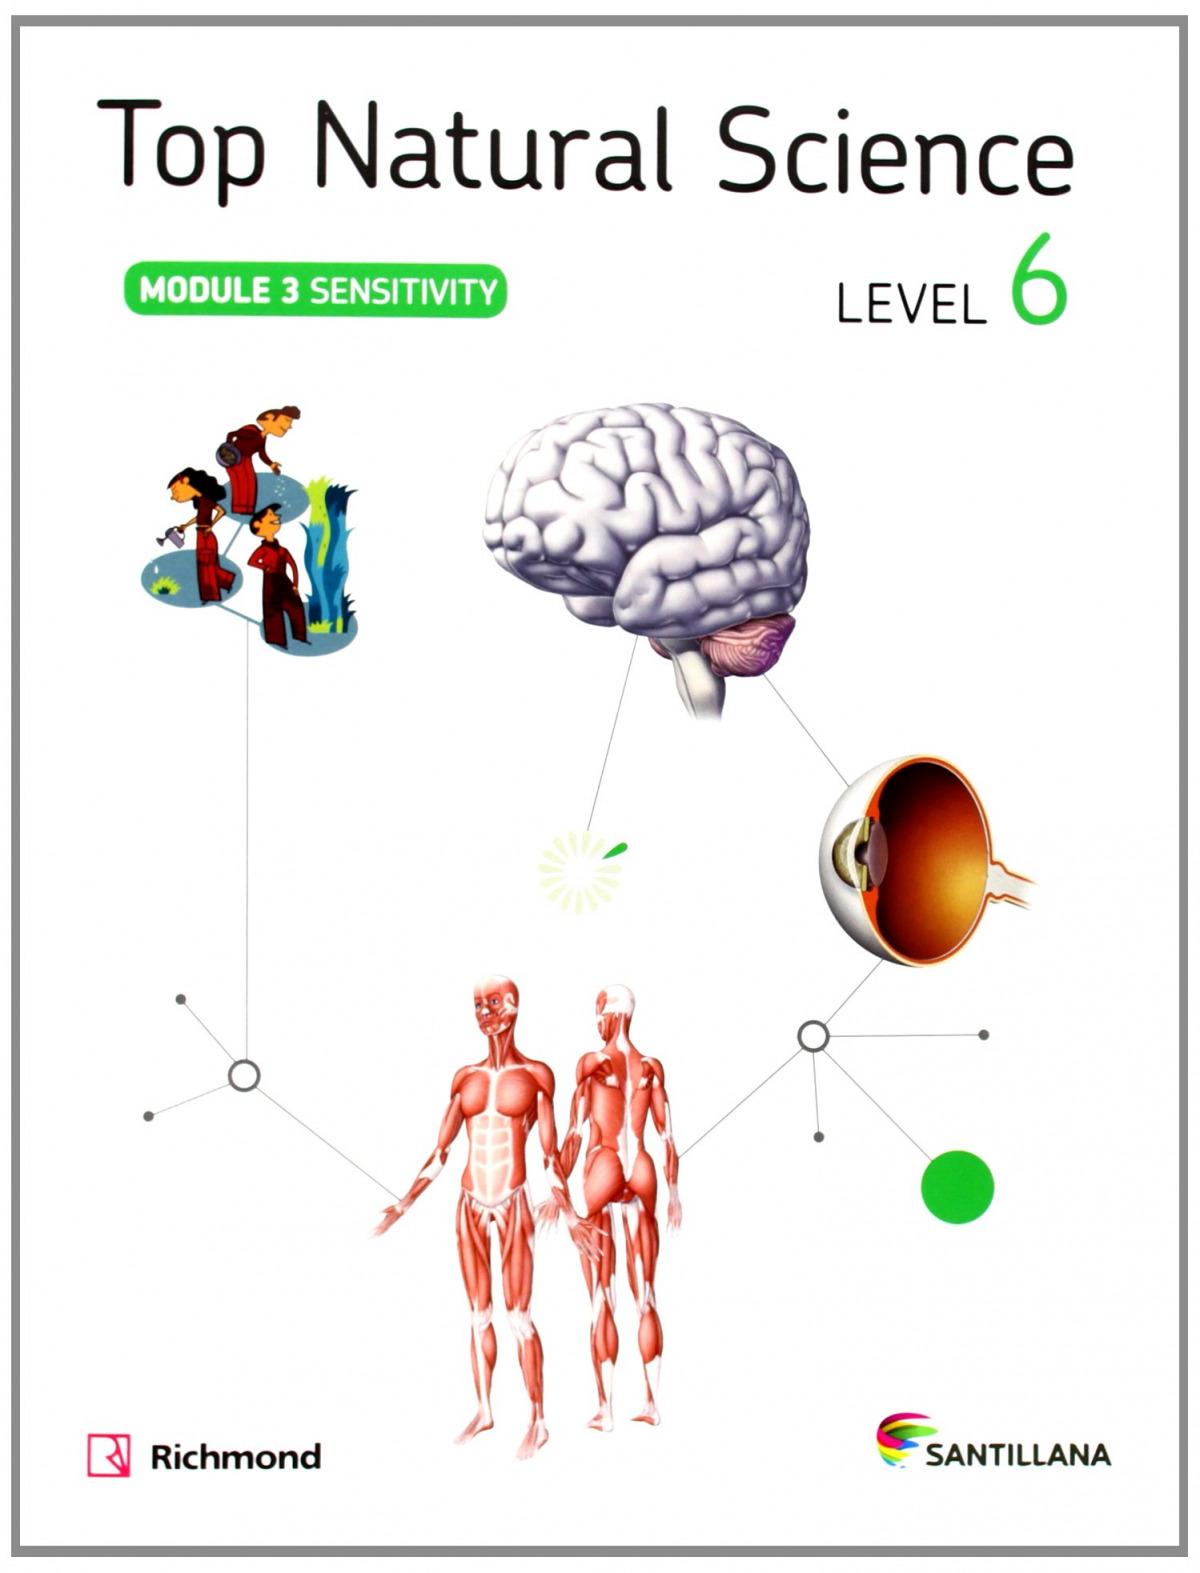 Top natural science 6. Sensitivity